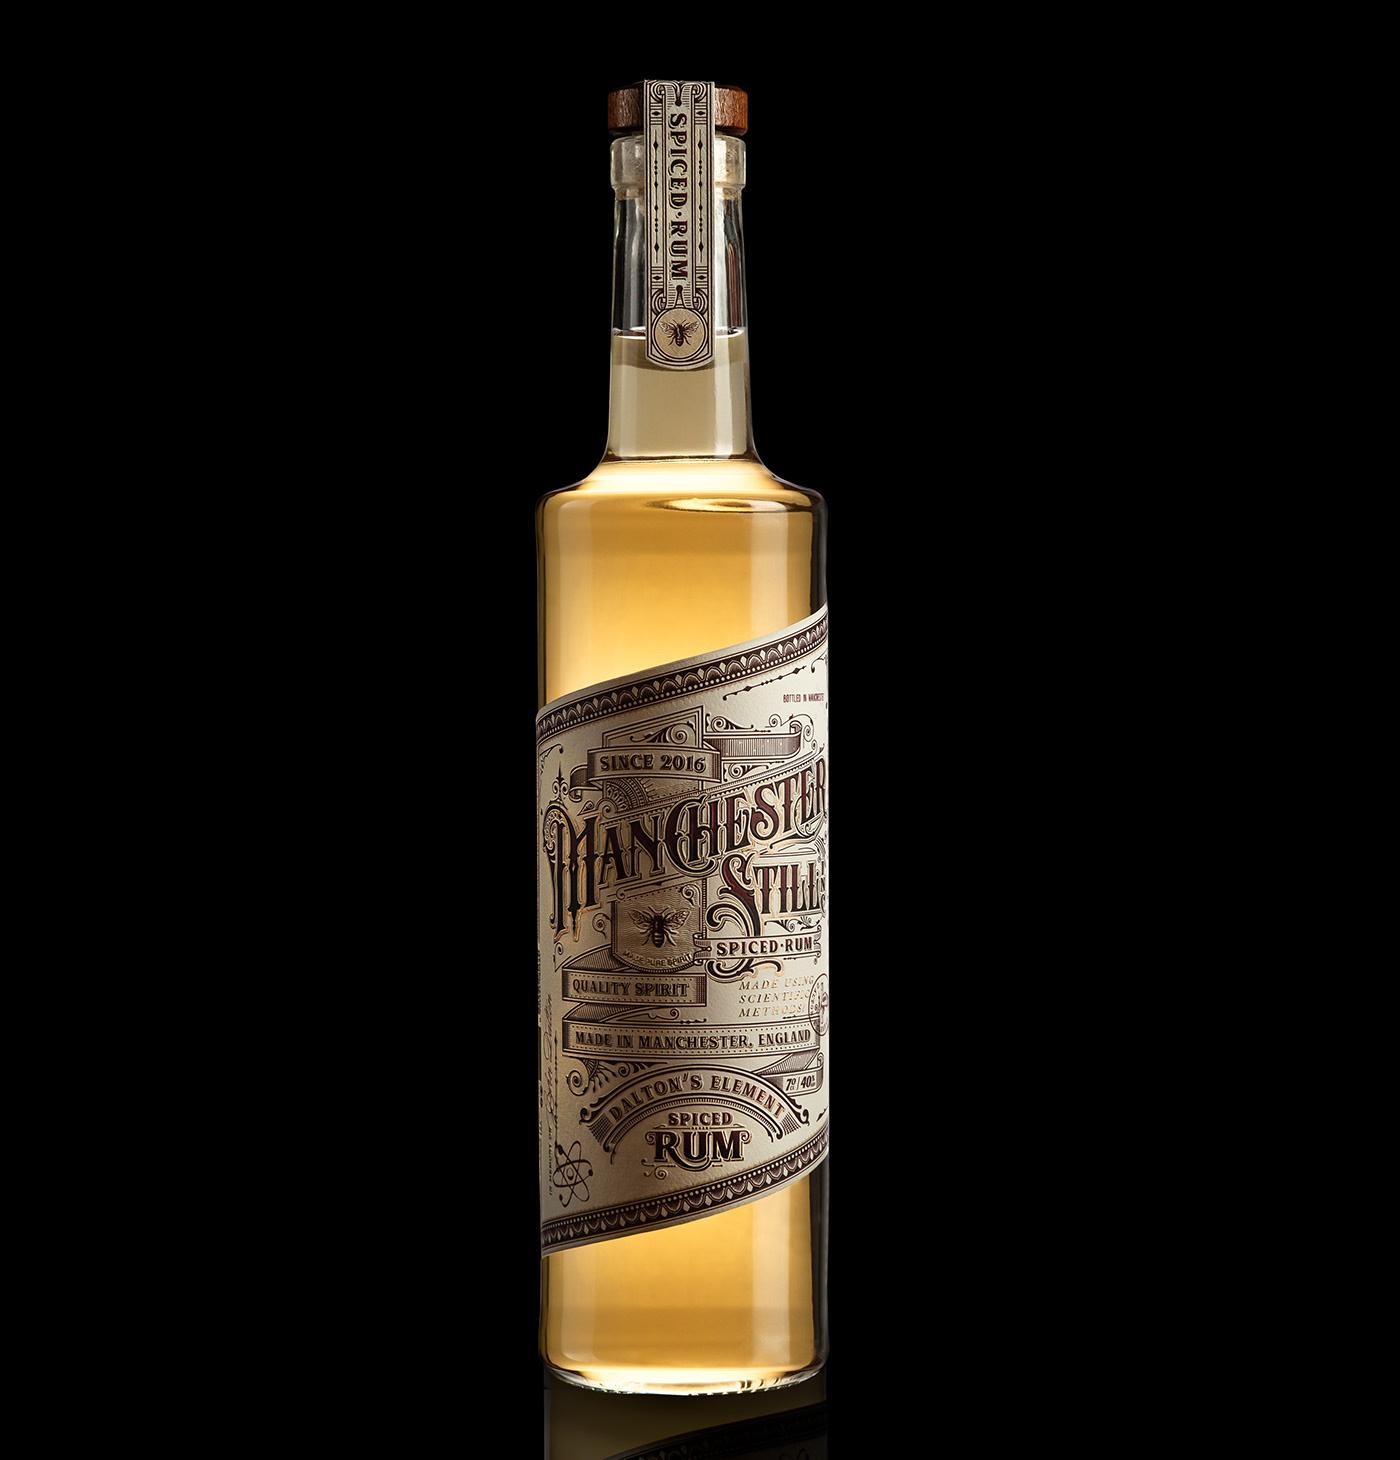 spirit,Rum,Packaging,Label,gin,Vodka,wine,branding ,premium,alcohol